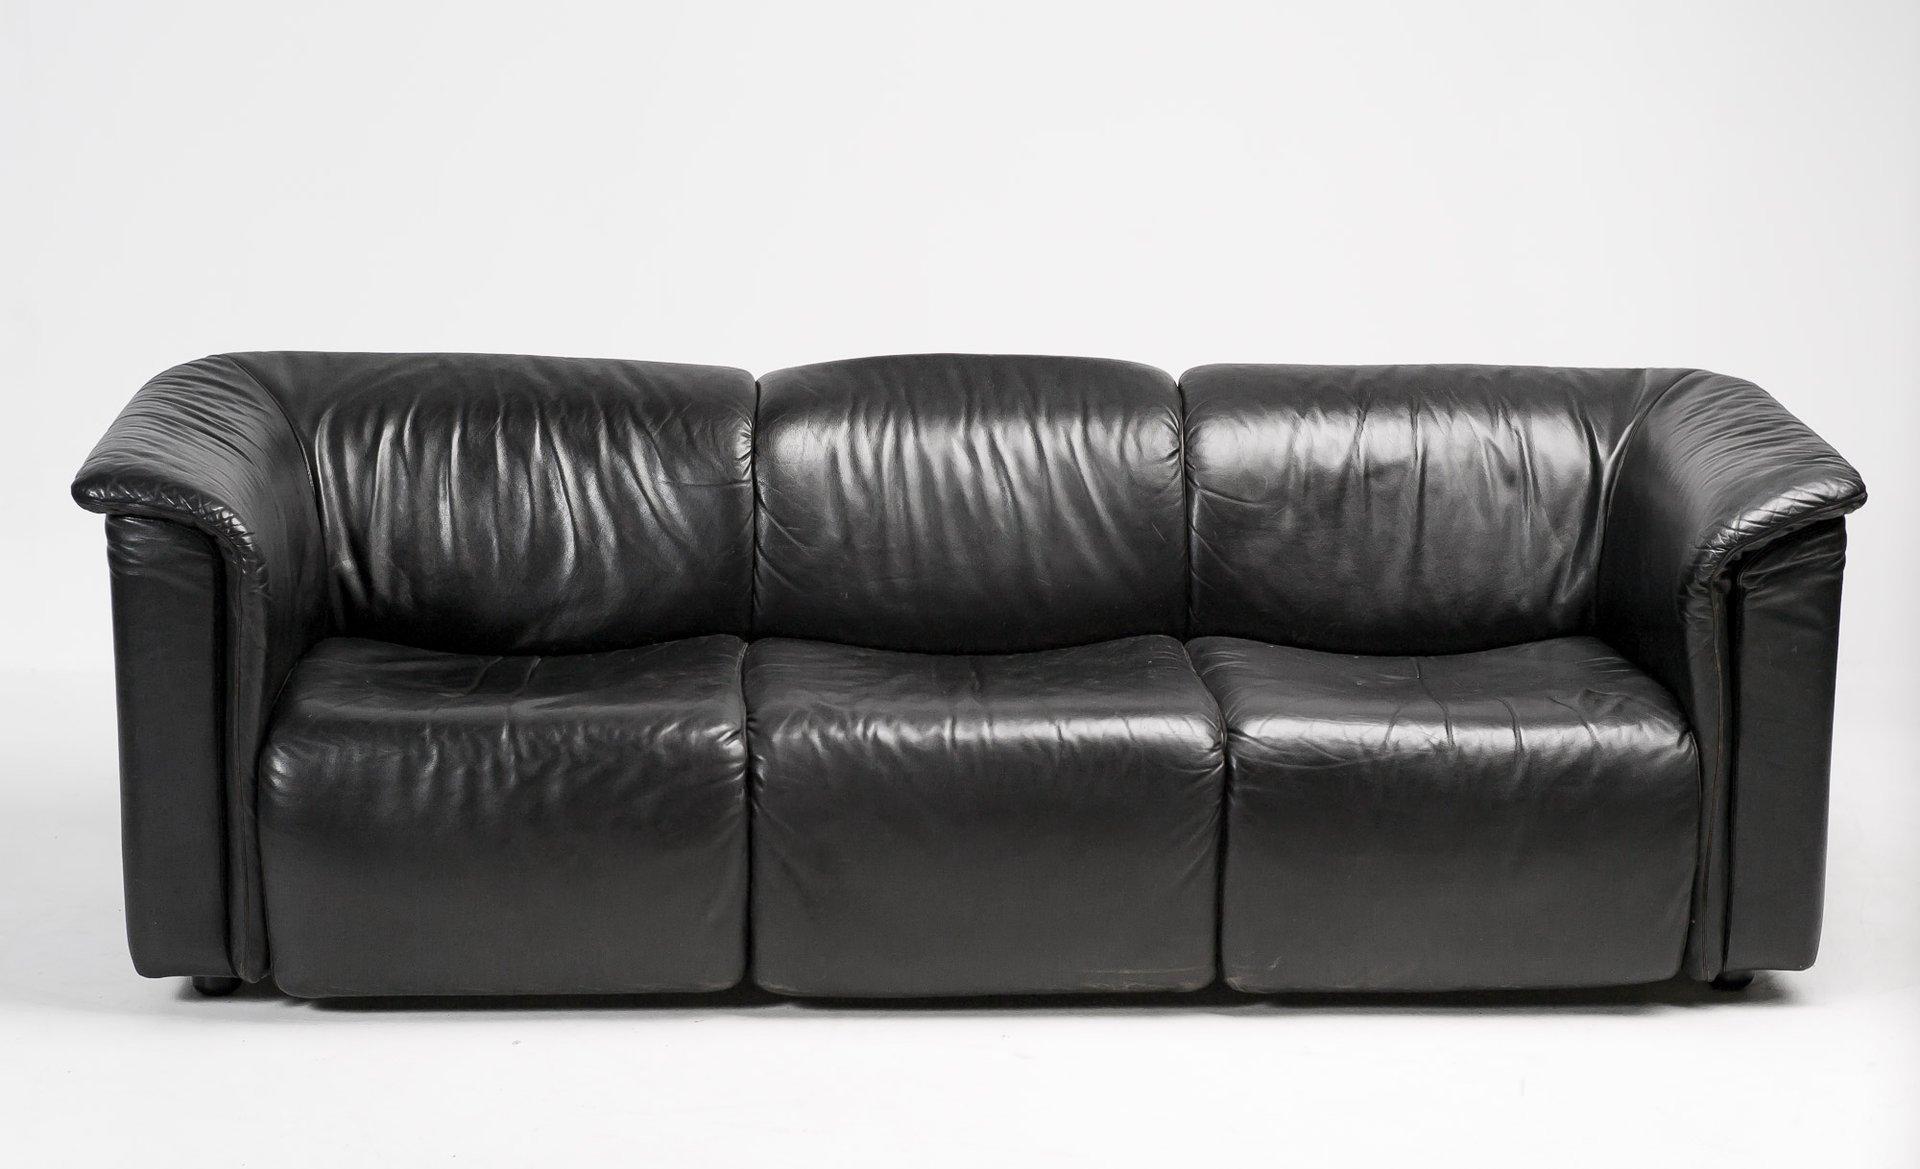 hochbarett black three seater sofa from wittmann moebel for sale at pamono. Black Bedroom Furniture Sets. Home Design Ideas